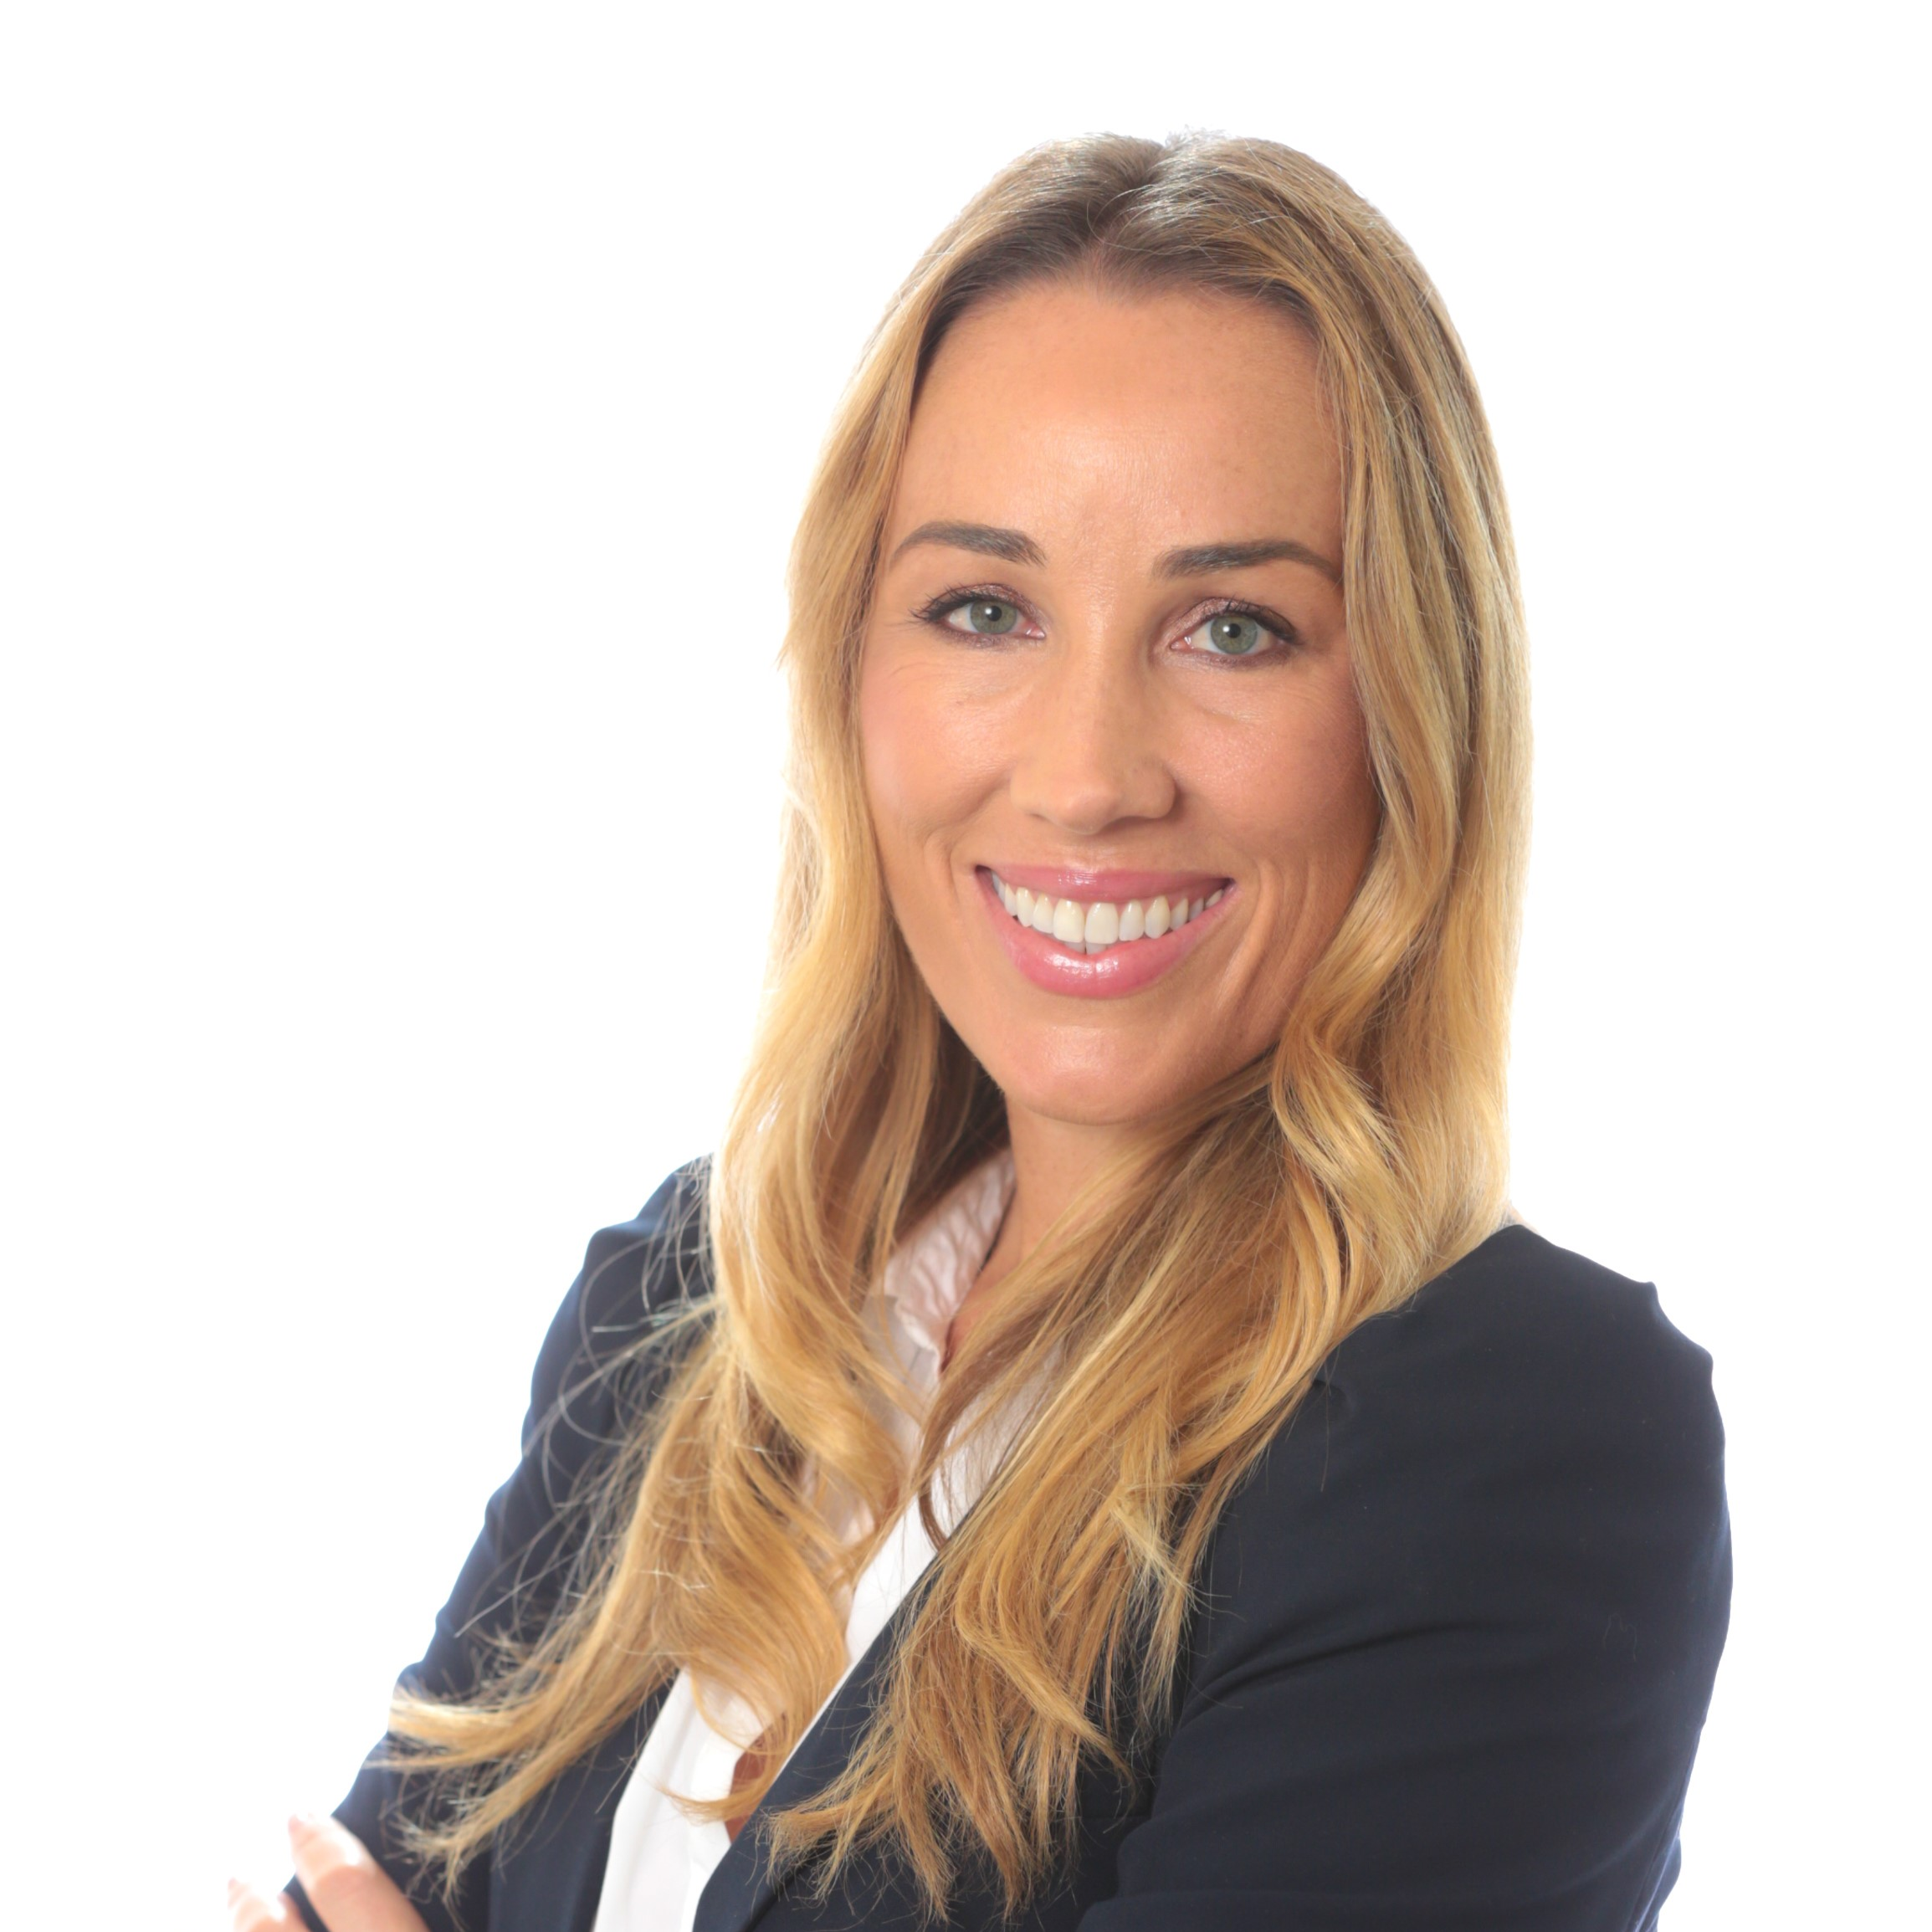 Jessica Kirby - Senior Vice President National & Strategic Accounts - On Premise, Young's Market Company